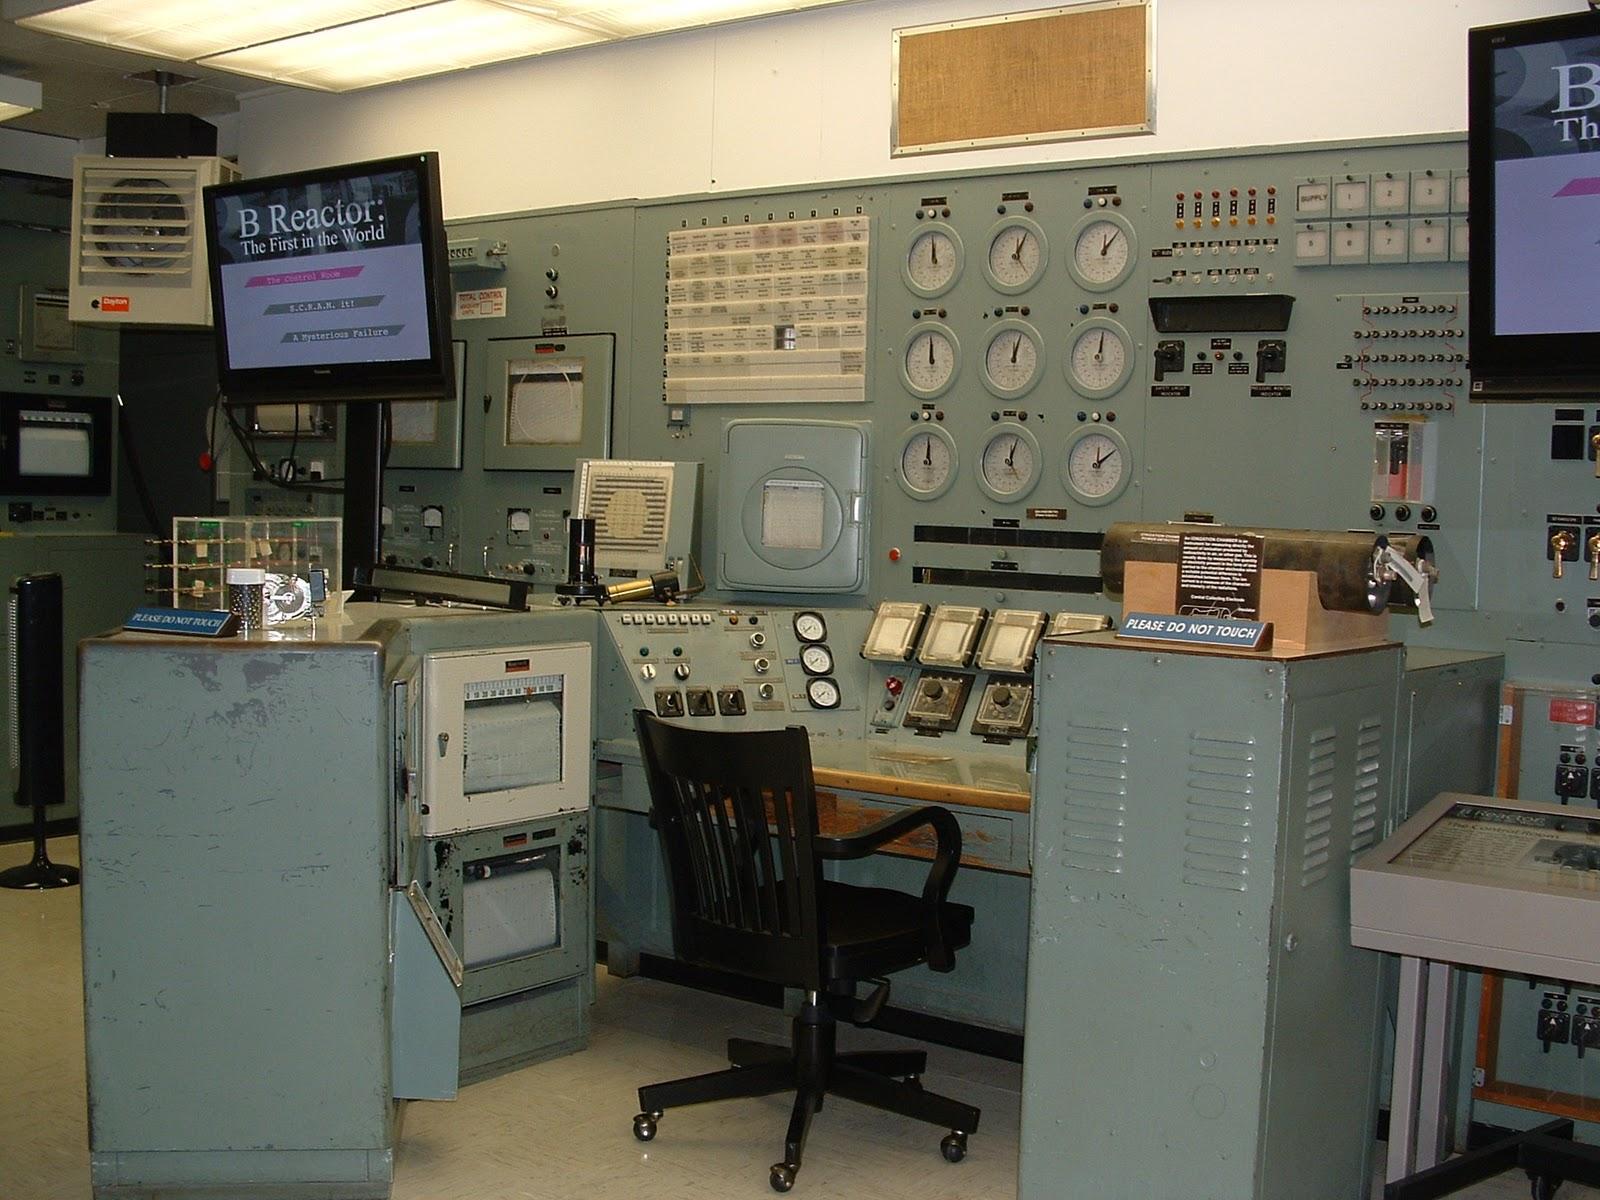 B Reactor The Mysterious Failure